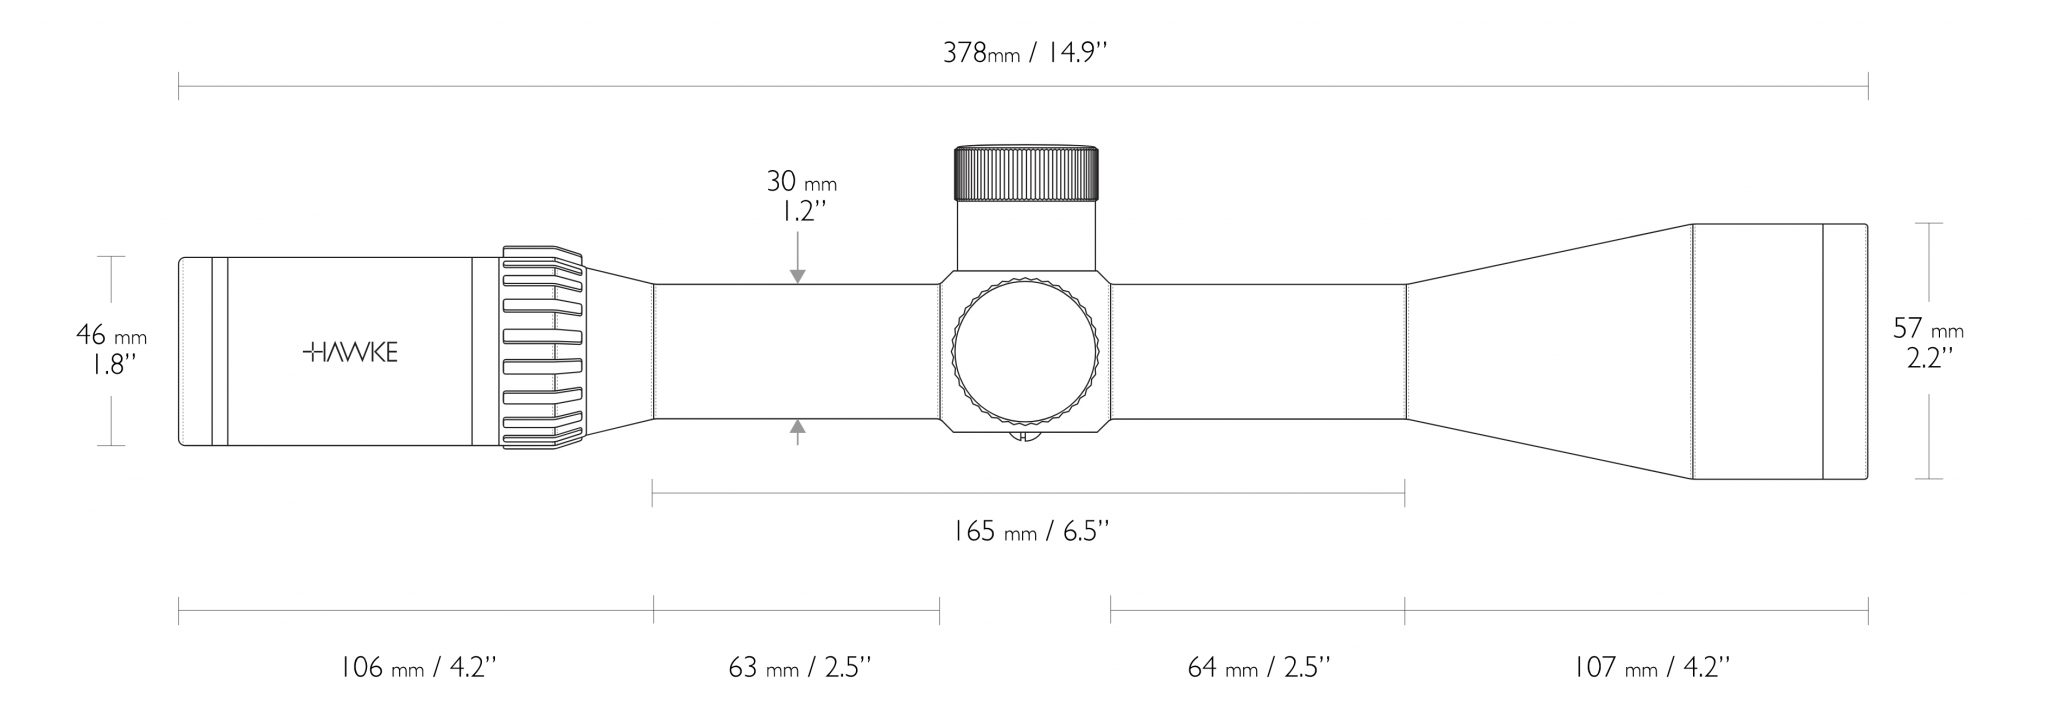 Hawke Airmax Dimensions